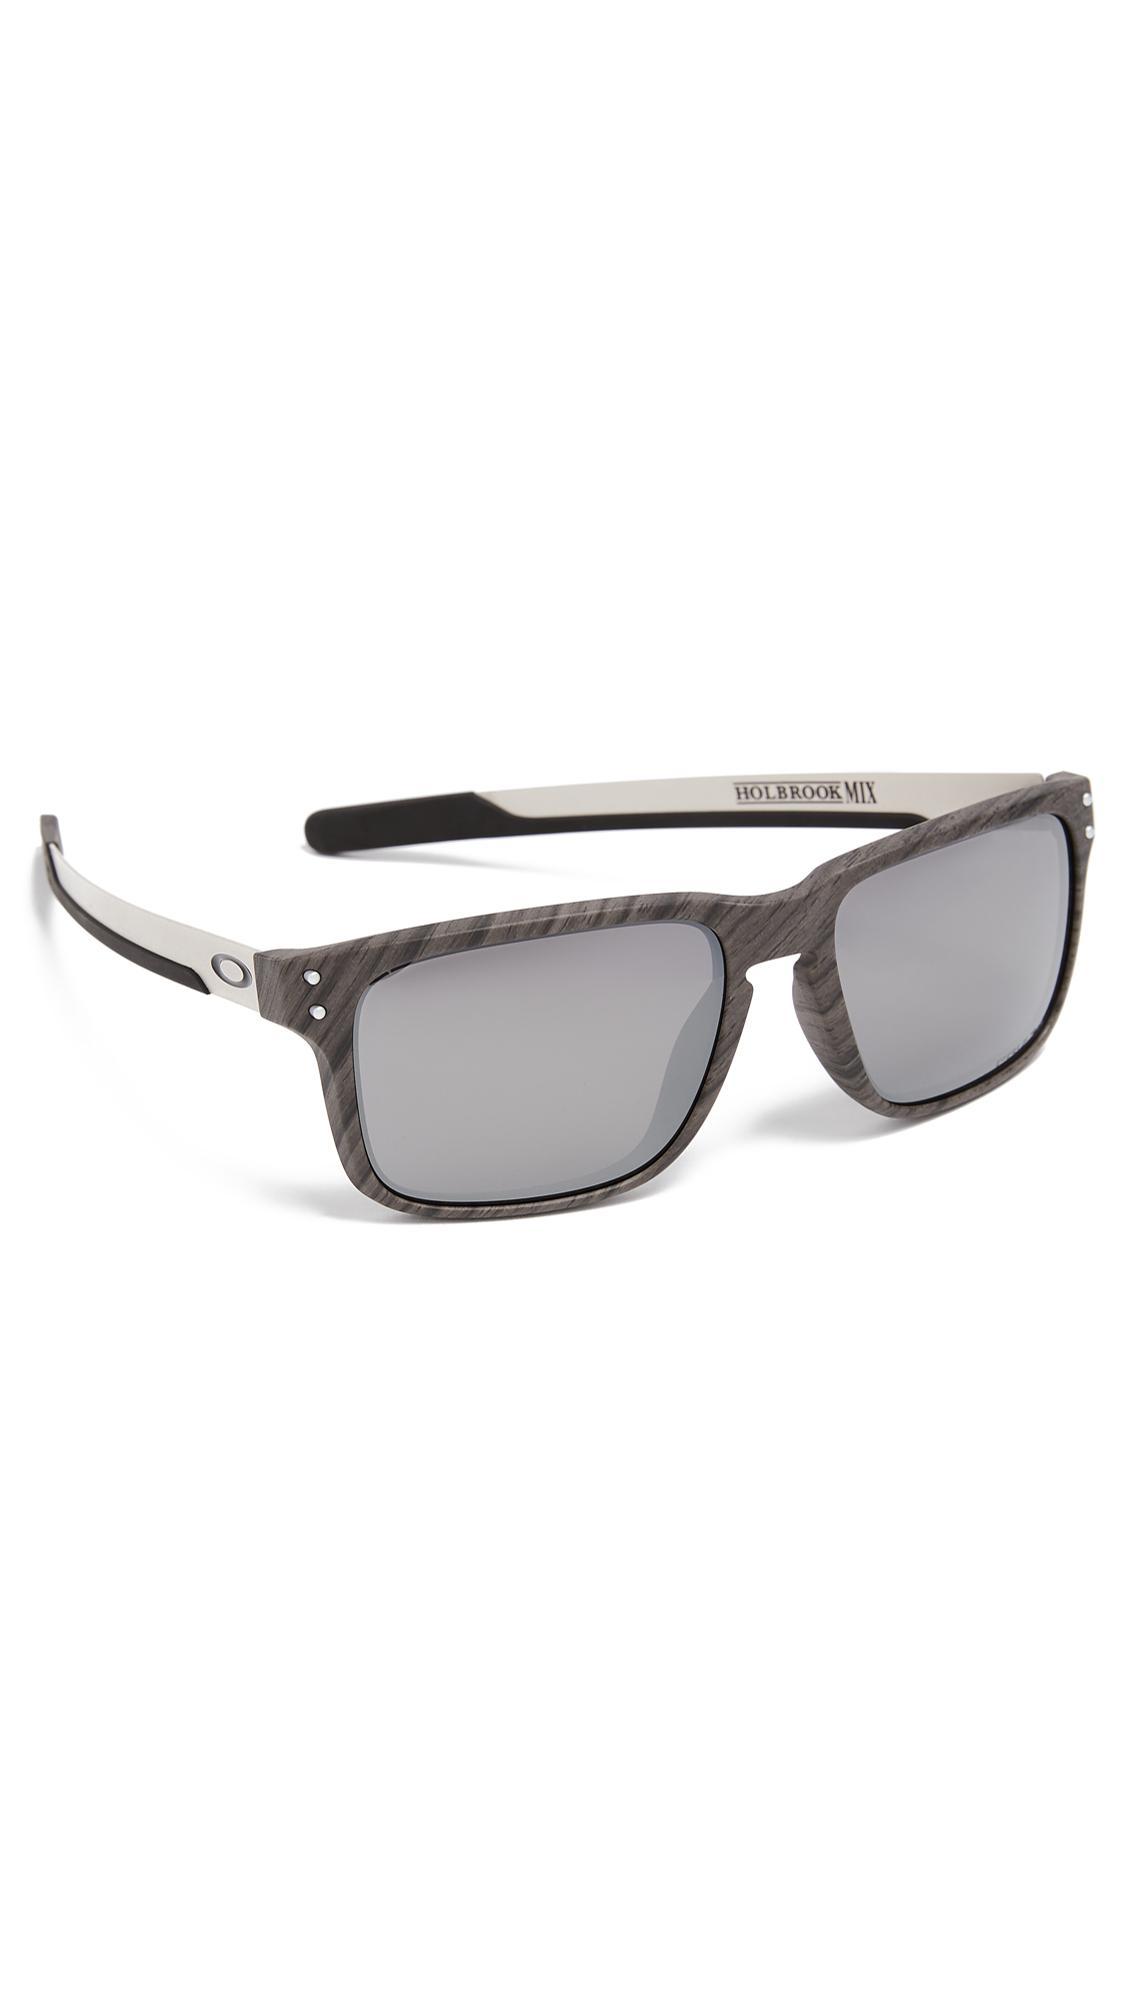 96b1021e3d ... new arrivals oakley holbrook woodgrain prizm sunglasses in metallic for  men lyst a8f16 8a0b5